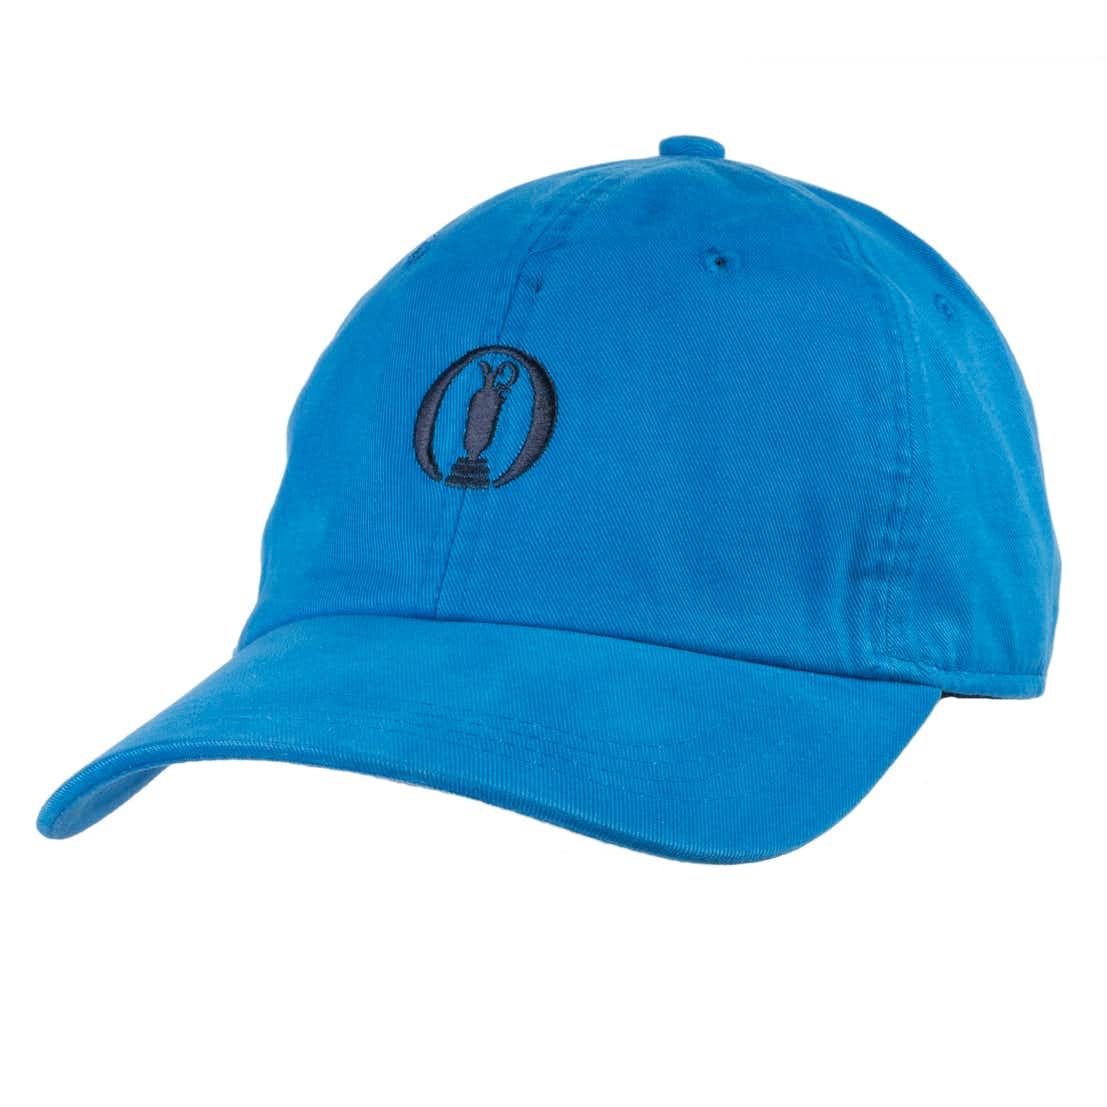 Tartan Collection Baseball Cap - Blue